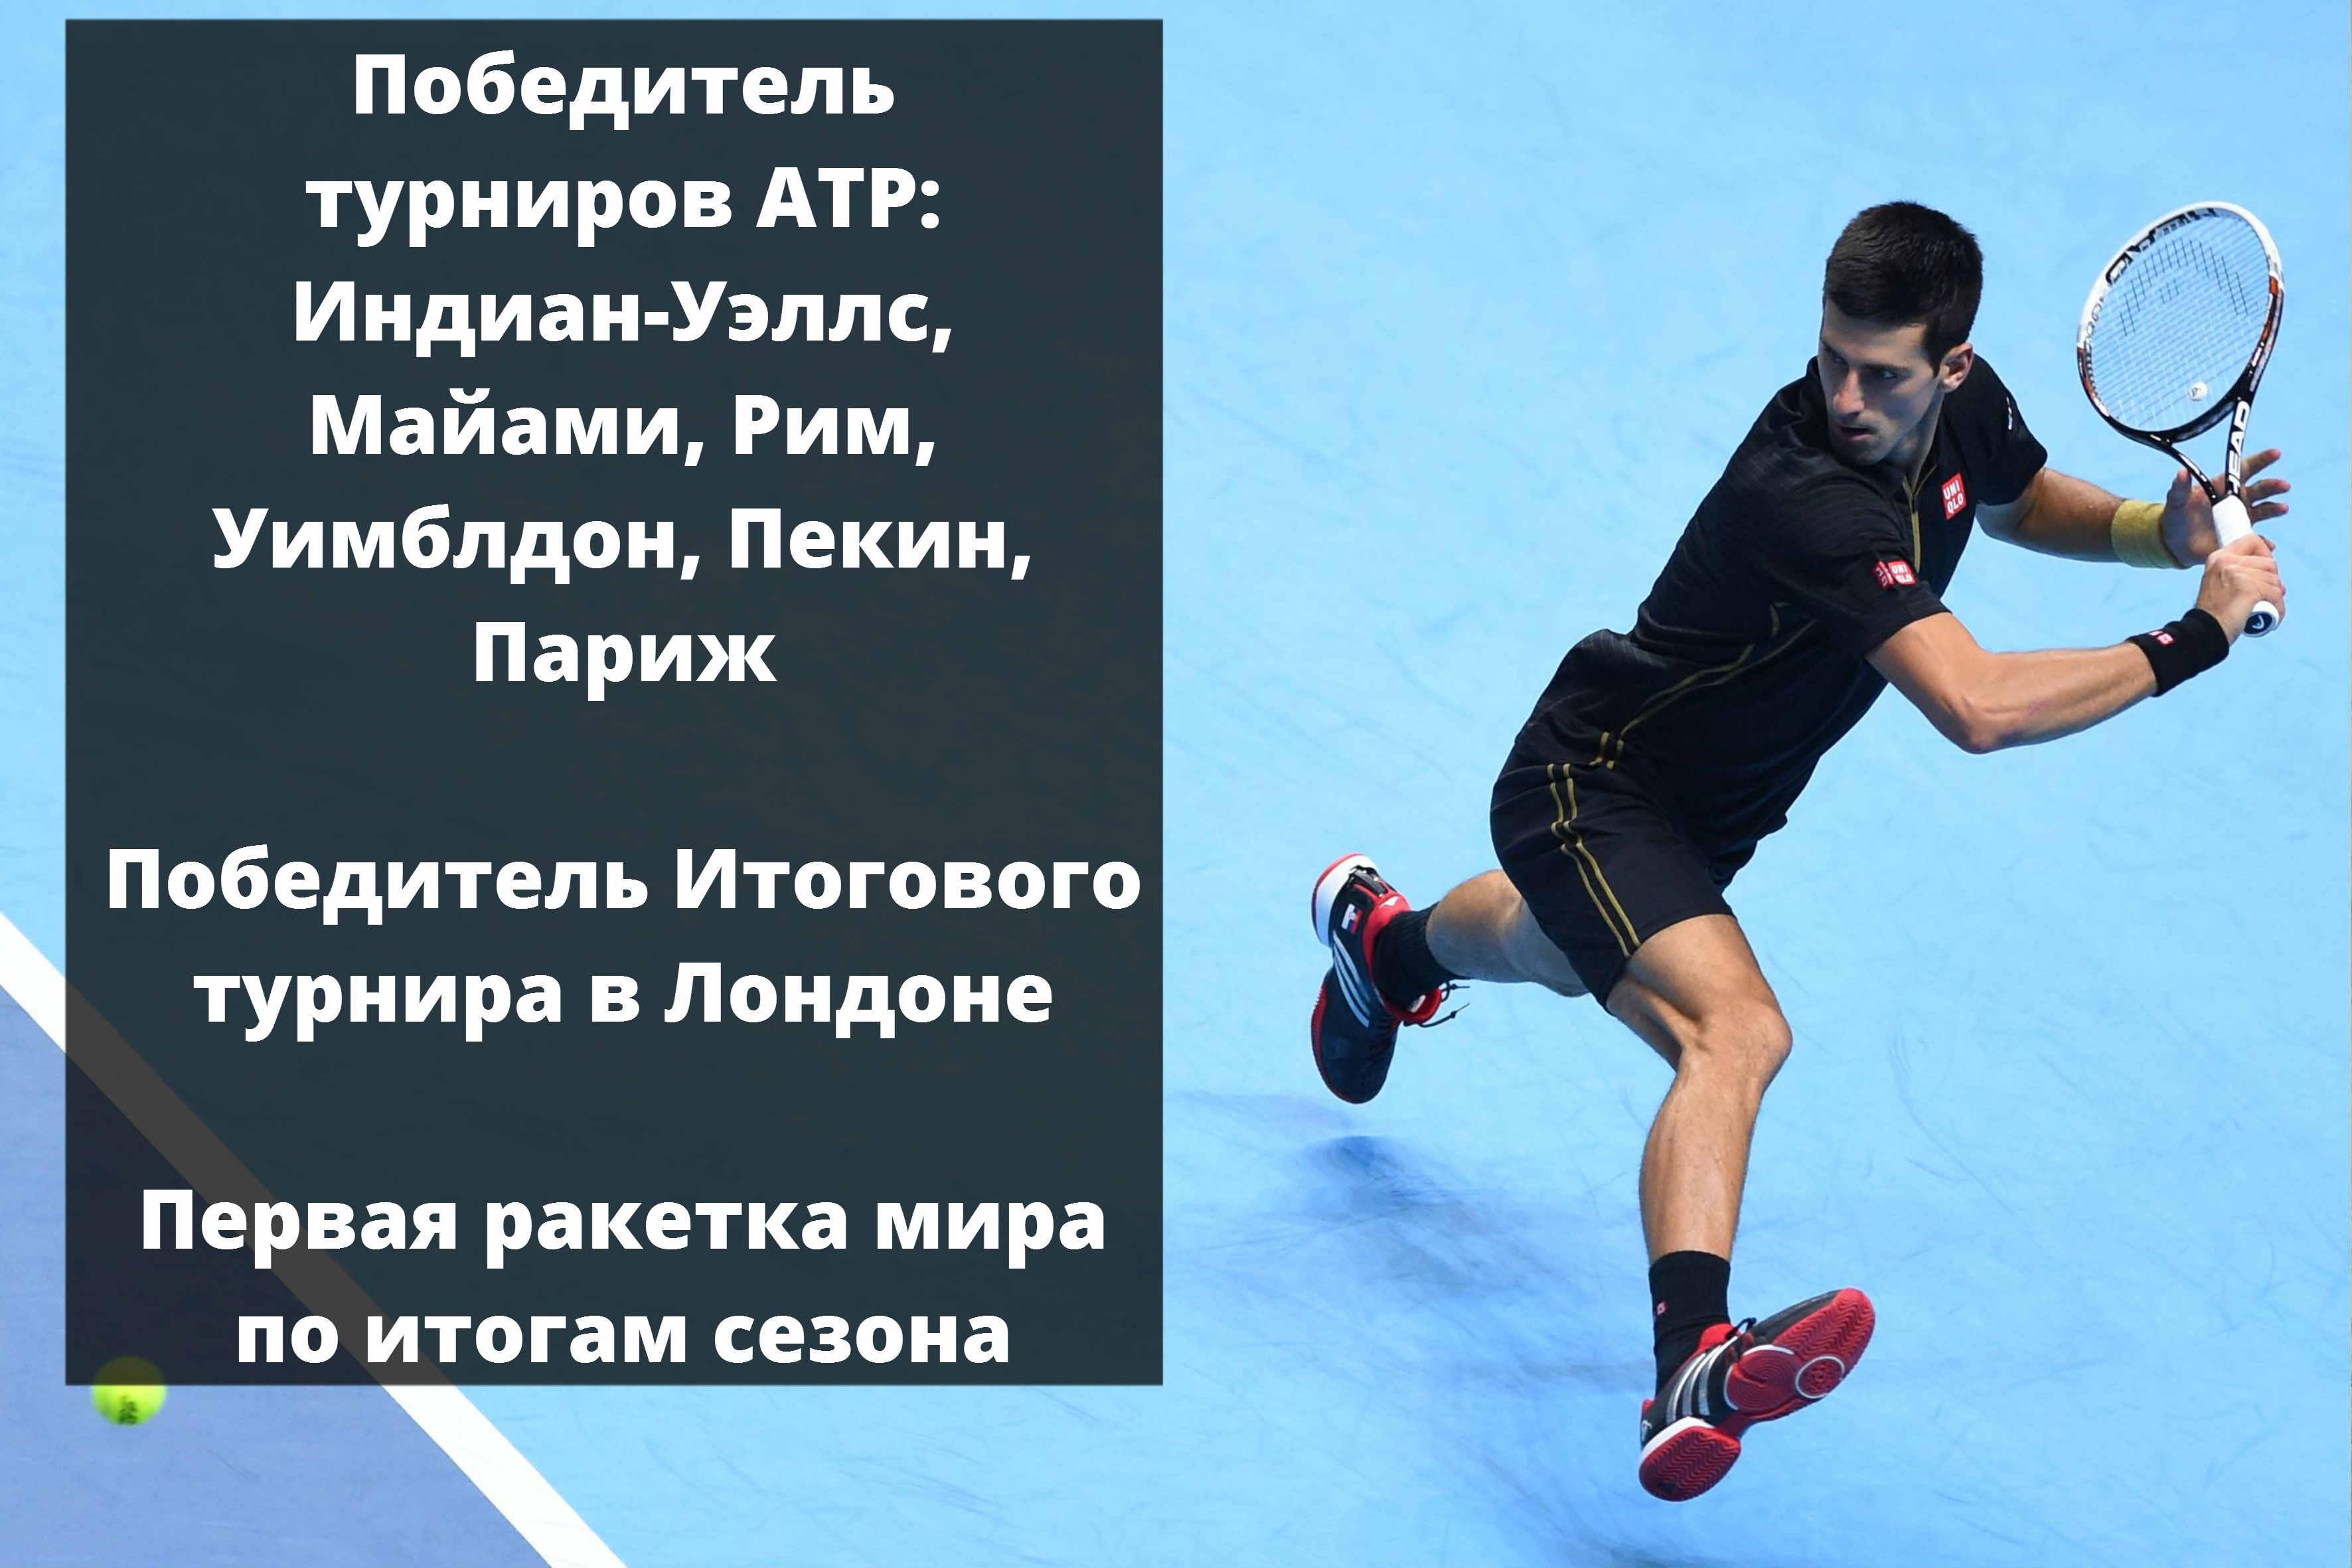 https://i.eurosport.com/2014/12/25/1377925.jpg